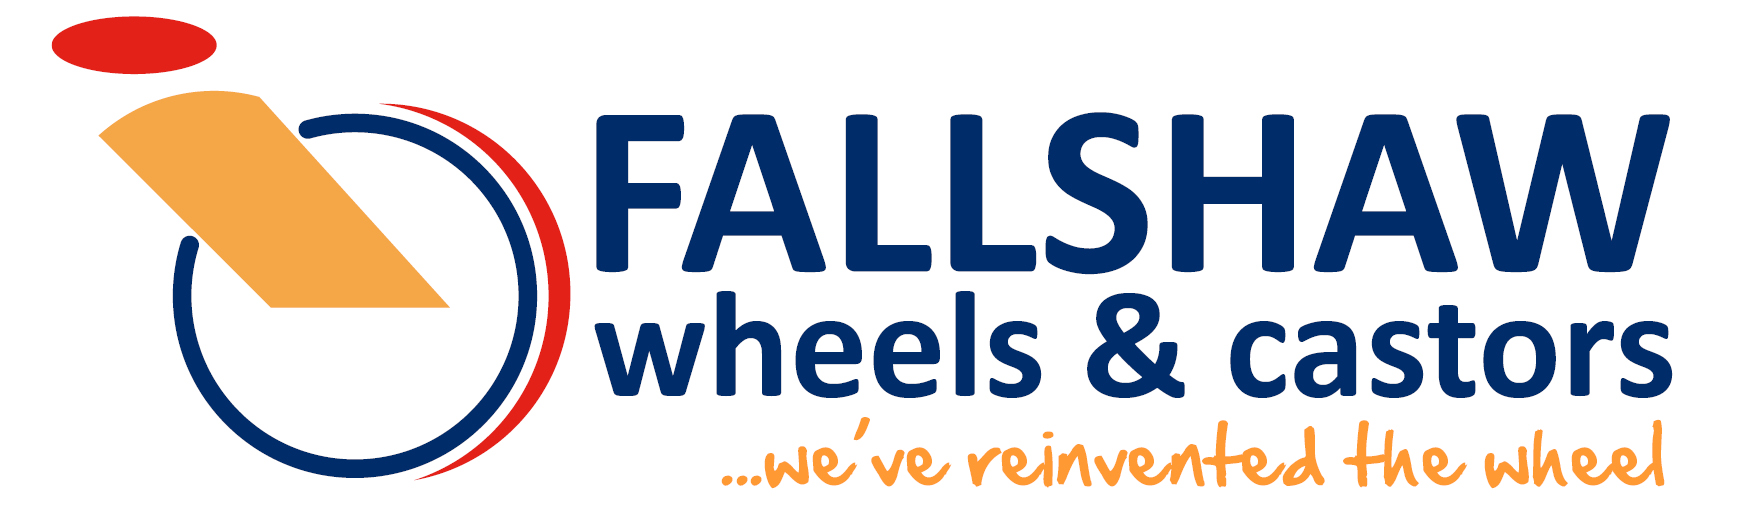 Fallshaw Wheels & Casters